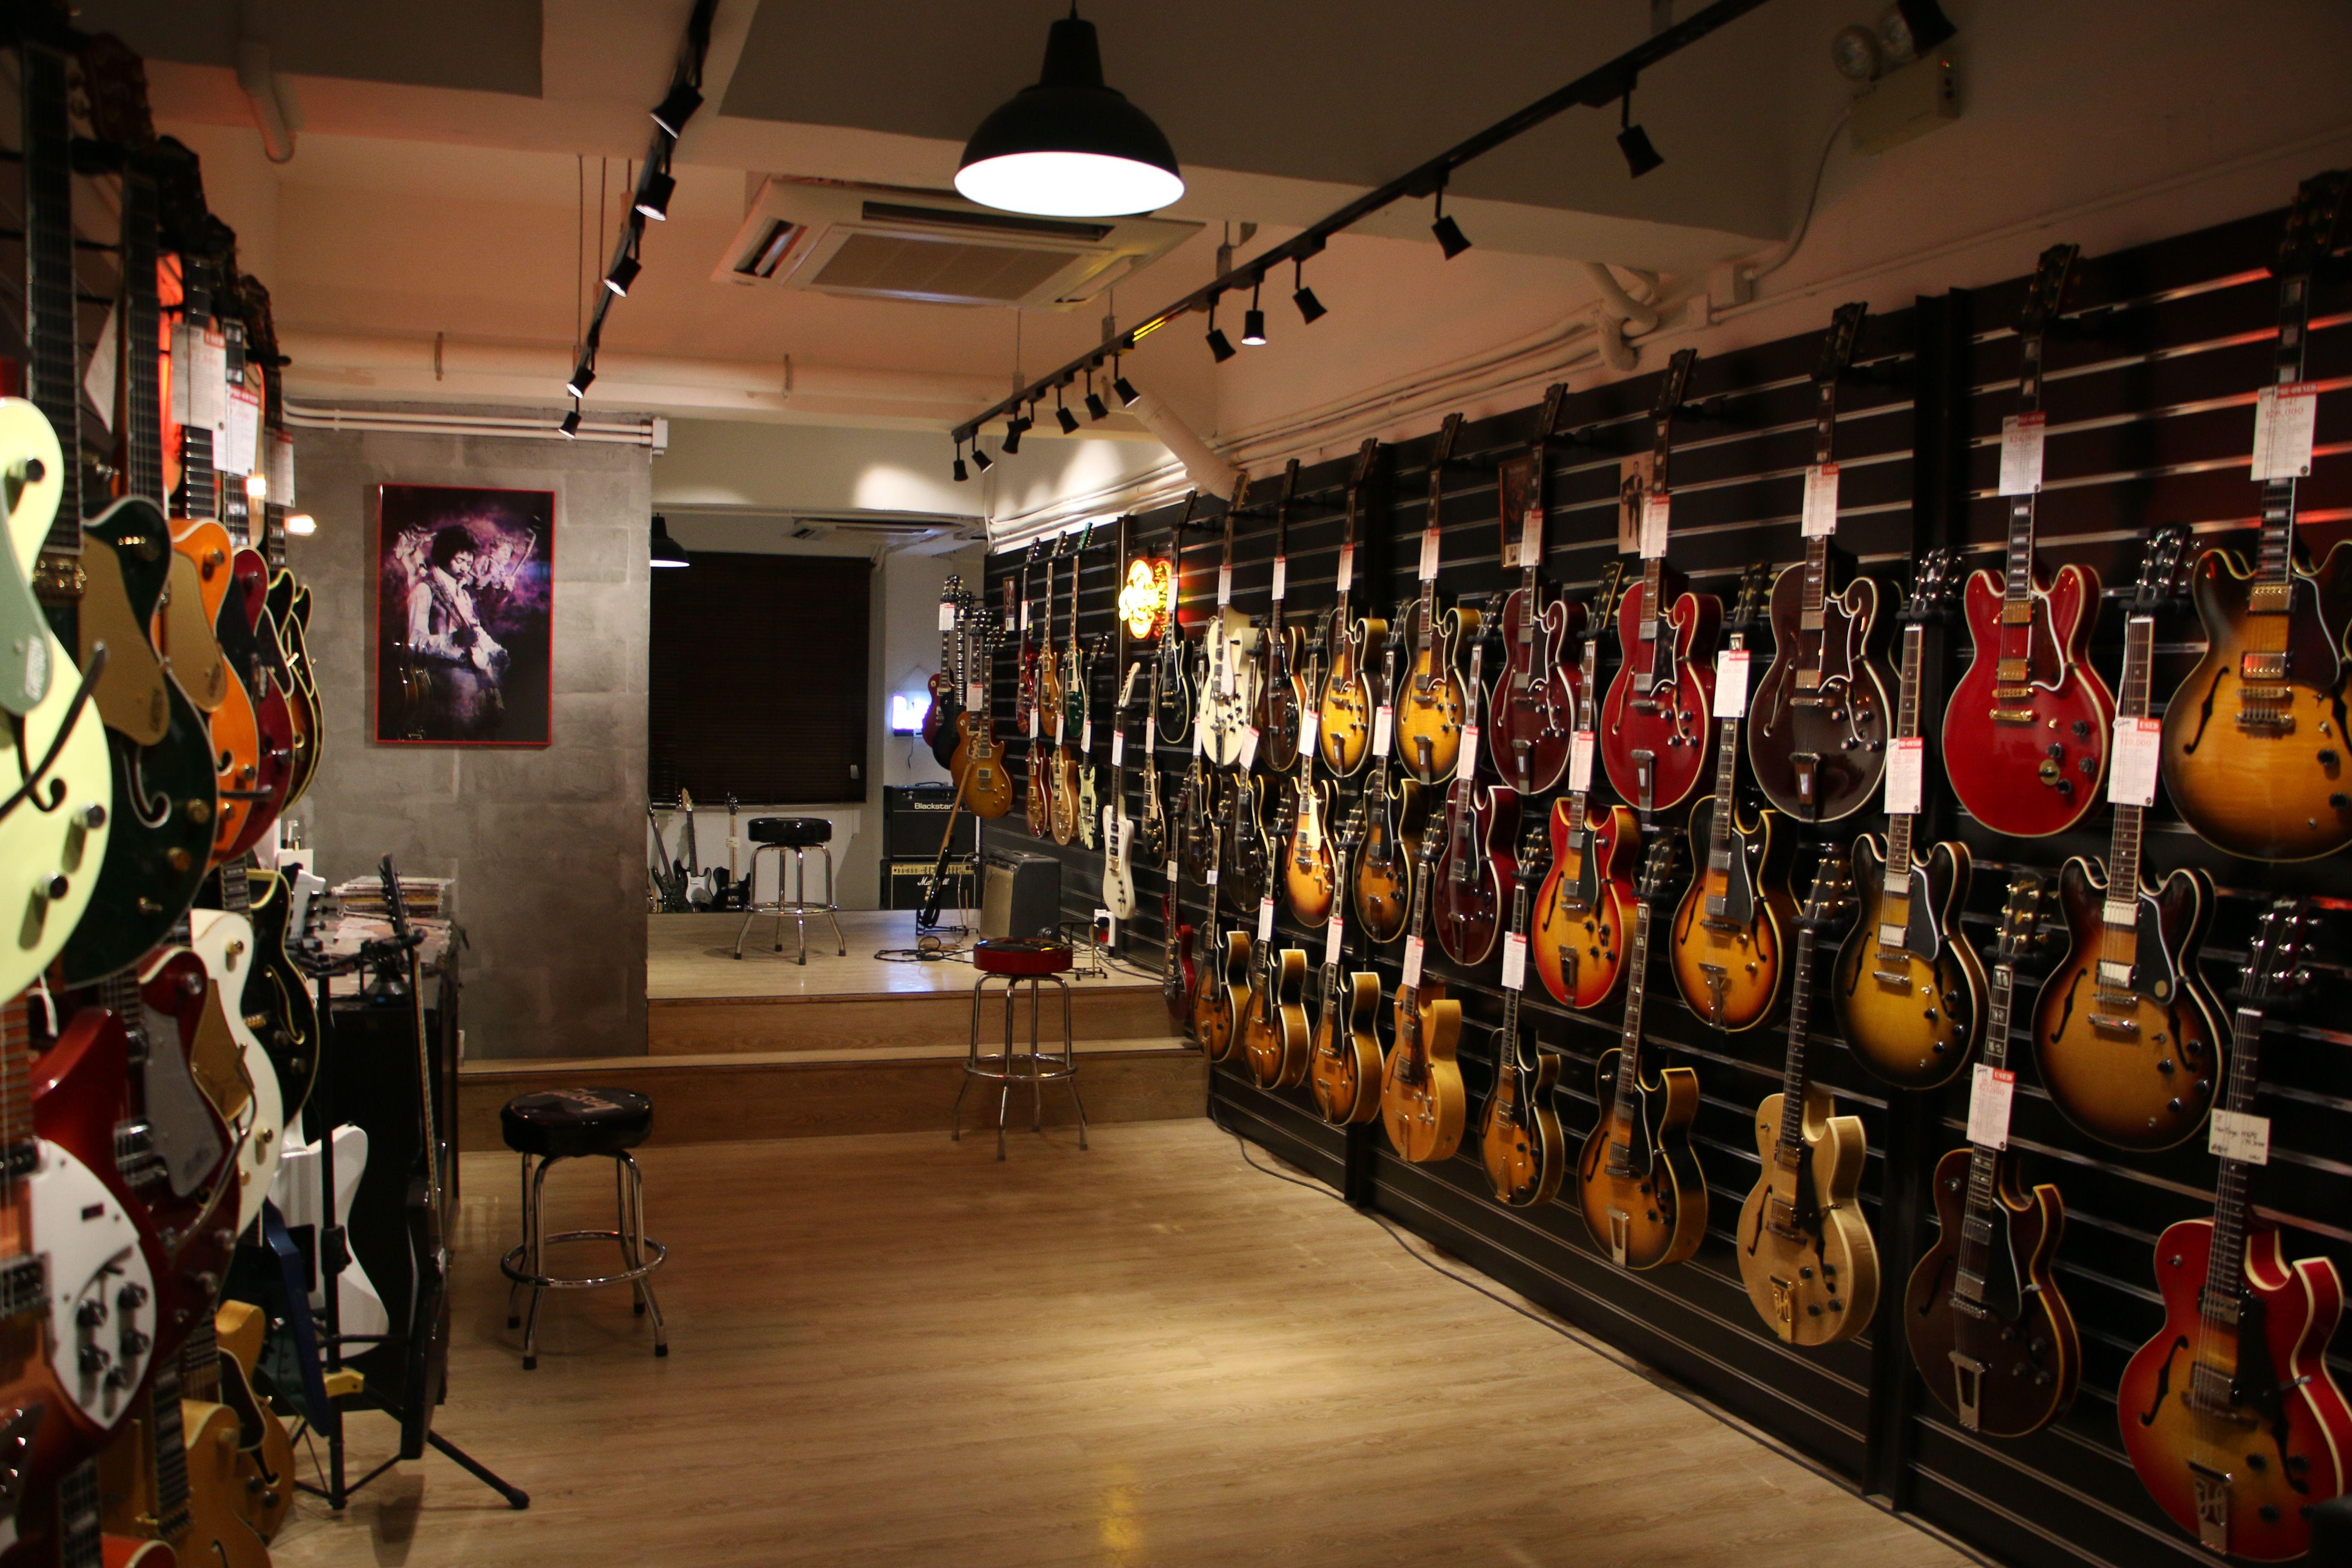 Nck Guitar Showroom In Hong Kong Ceiling Lights Track Lighting Guitar Shop